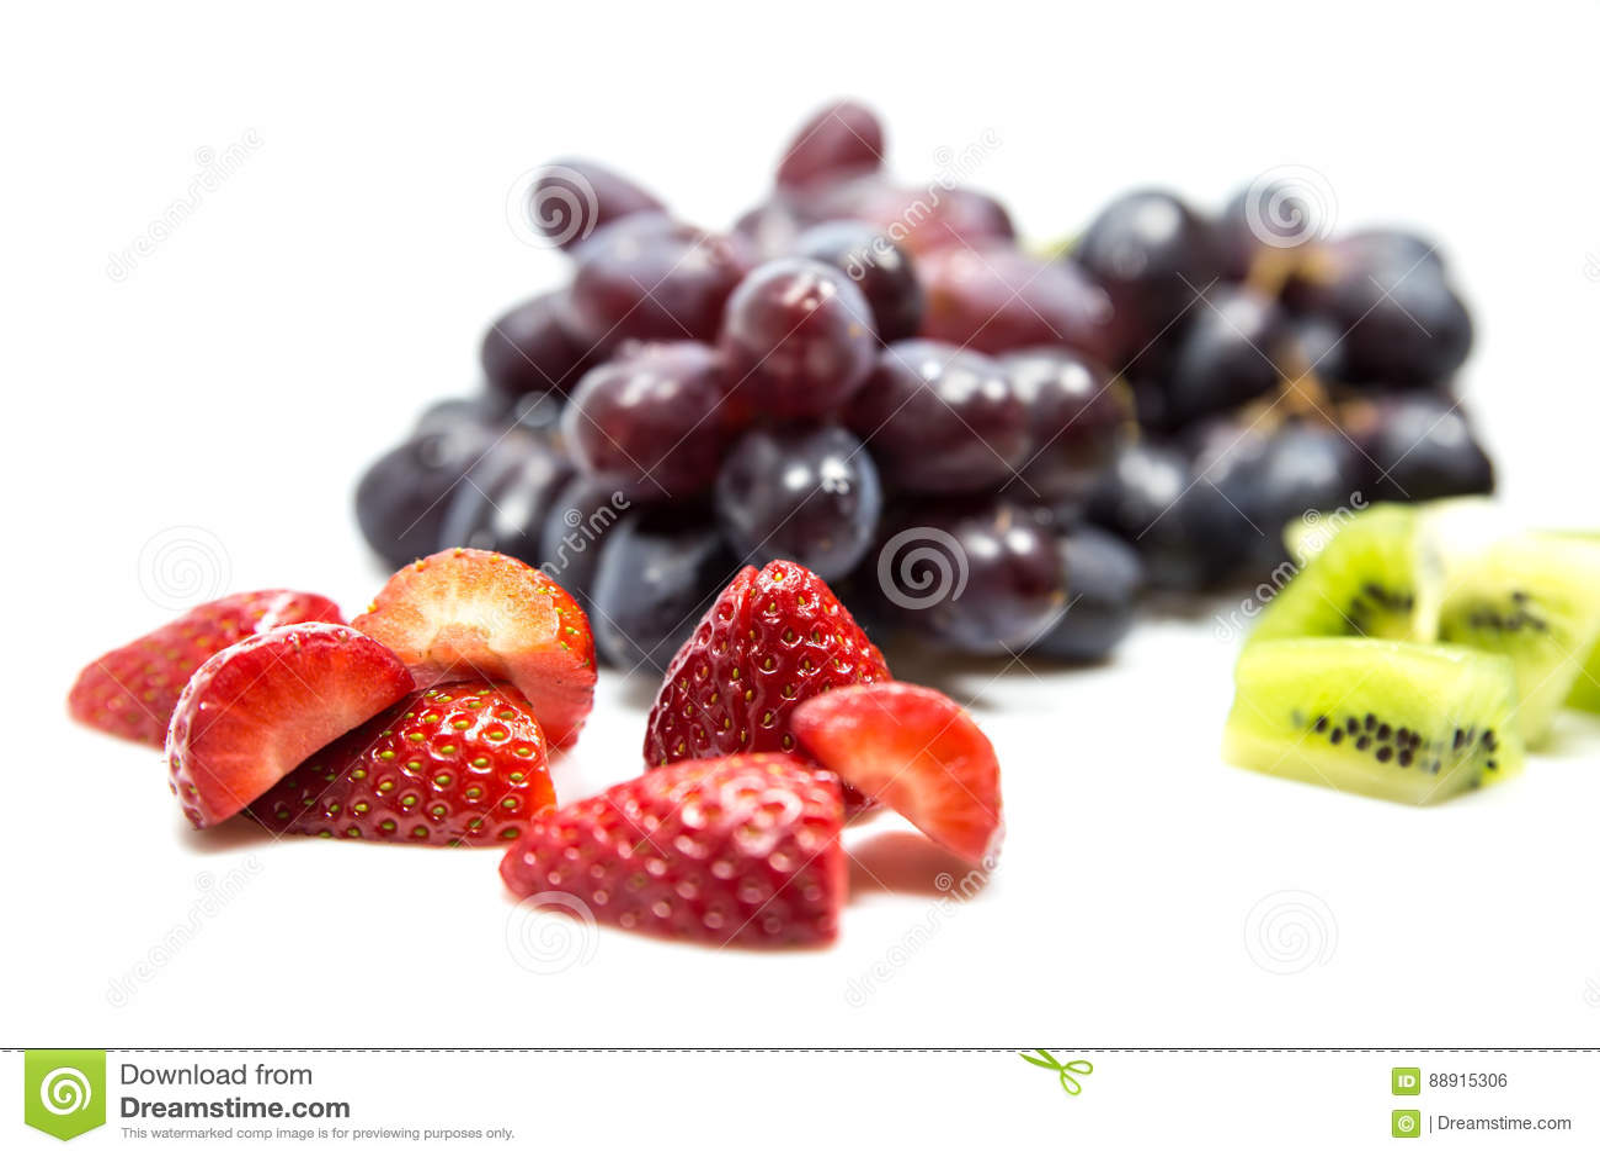 Grapes, strawberrys and kiwis